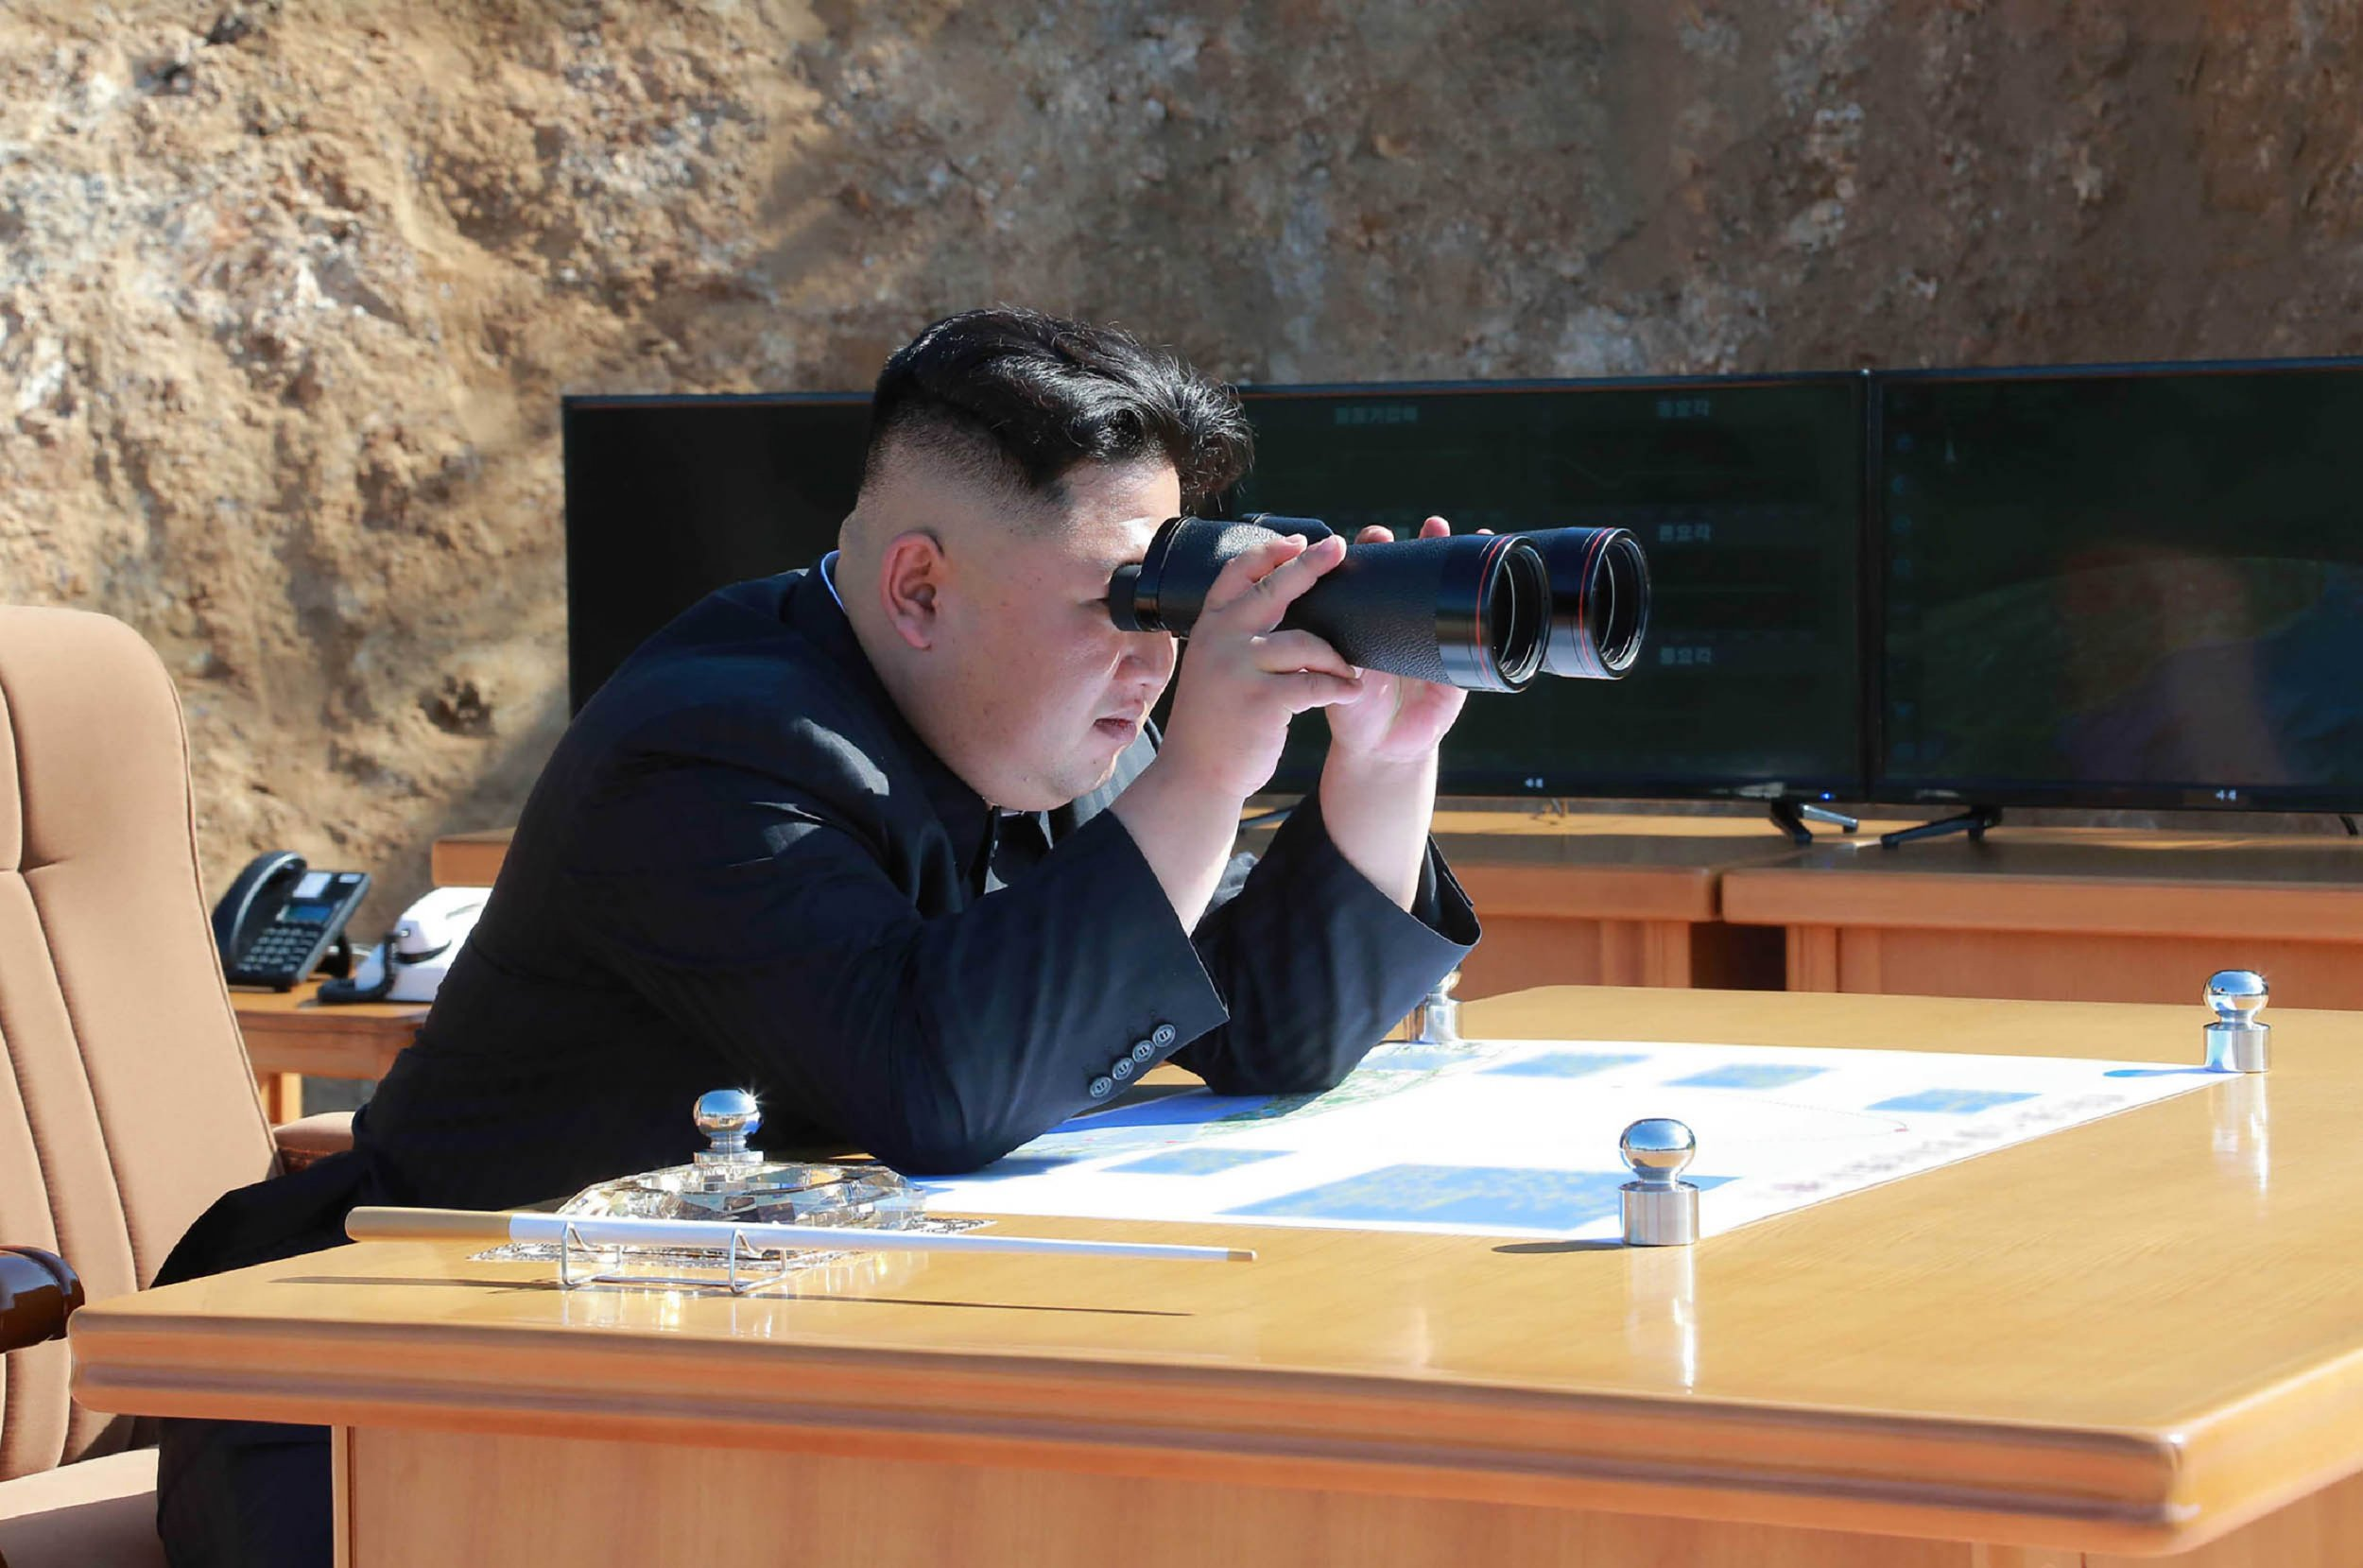 Kim Jong-Un nuclear weapons